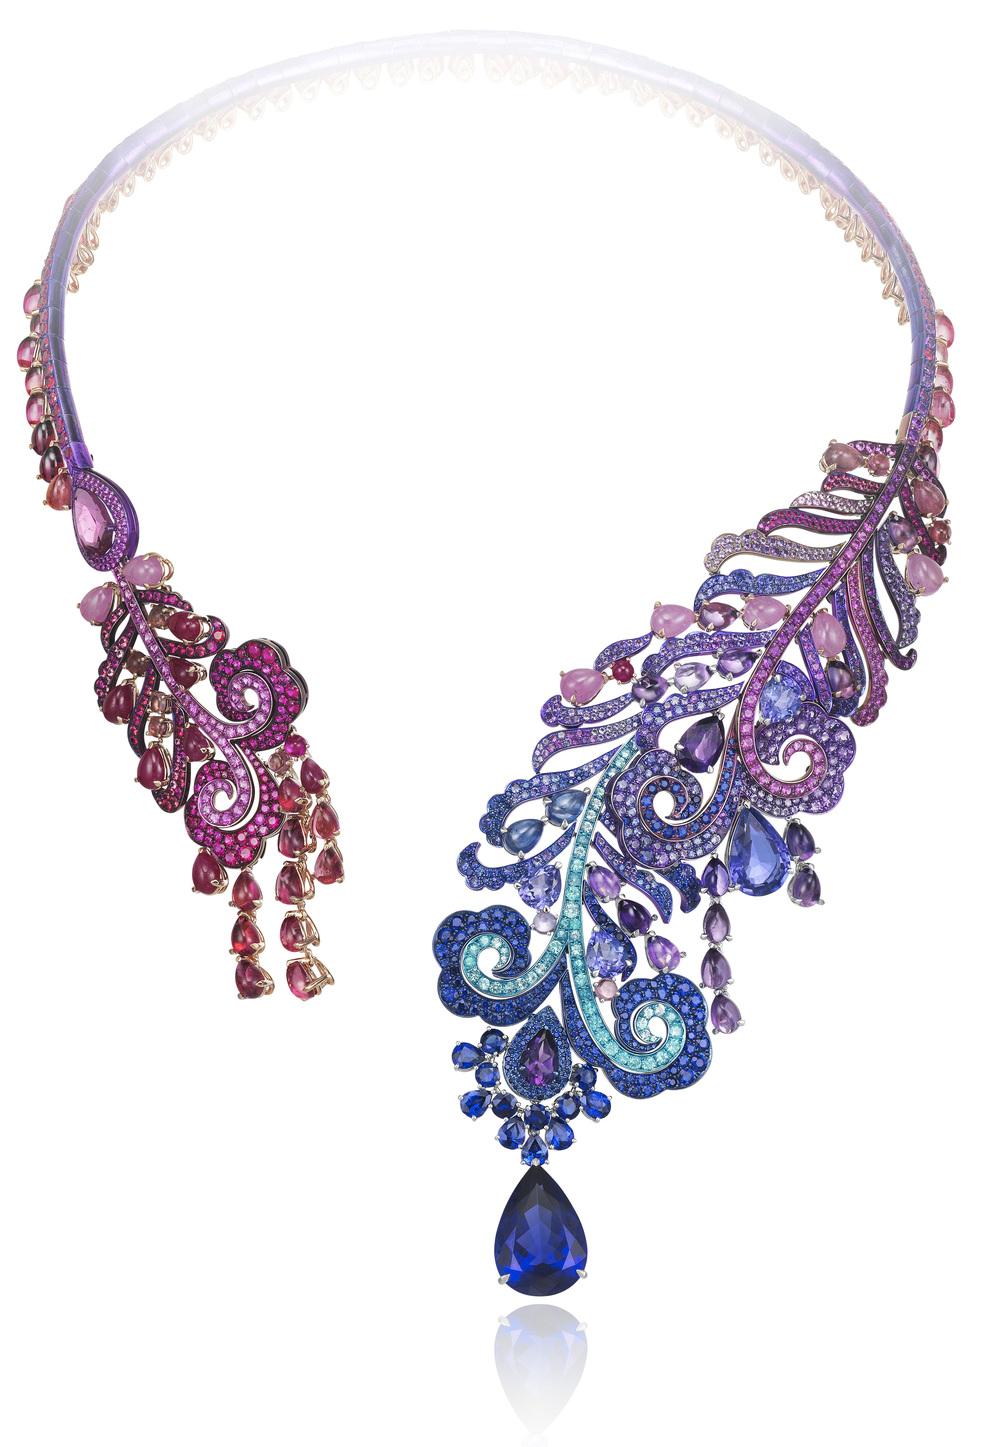 810429-9001 Haute Joaillerie Necklace.jpg